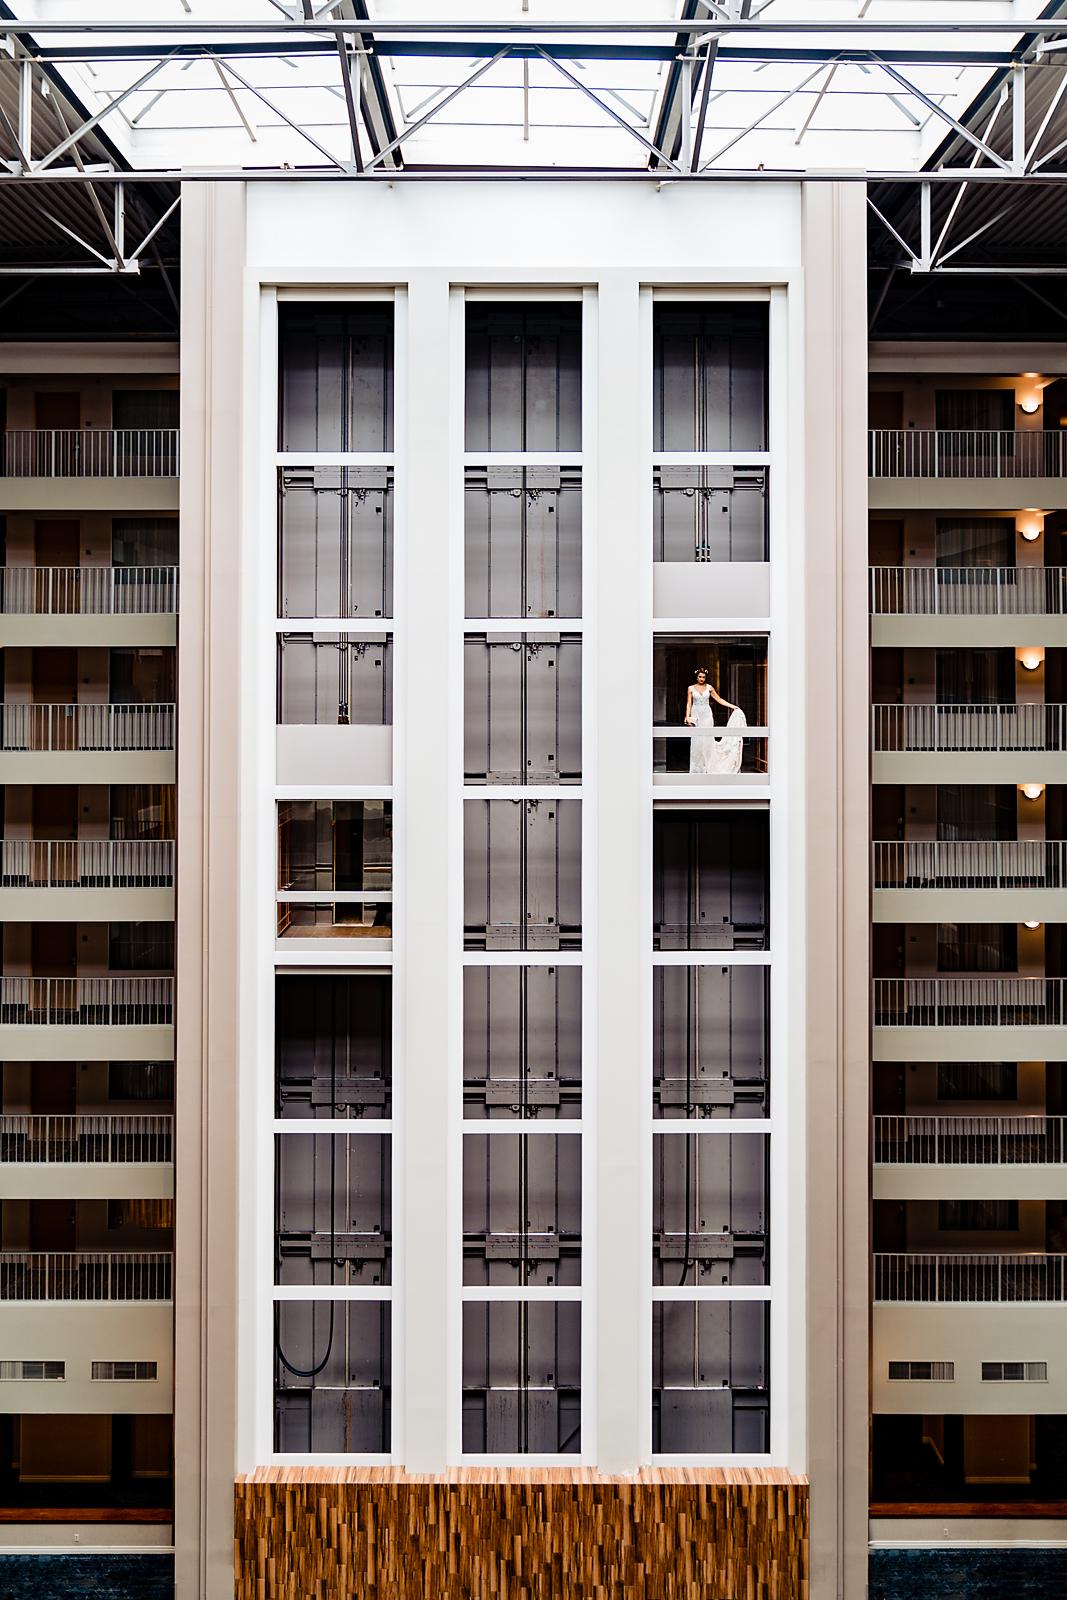 Embassy-Suites-Rivercenter-Wedding-Photography-7.jpg